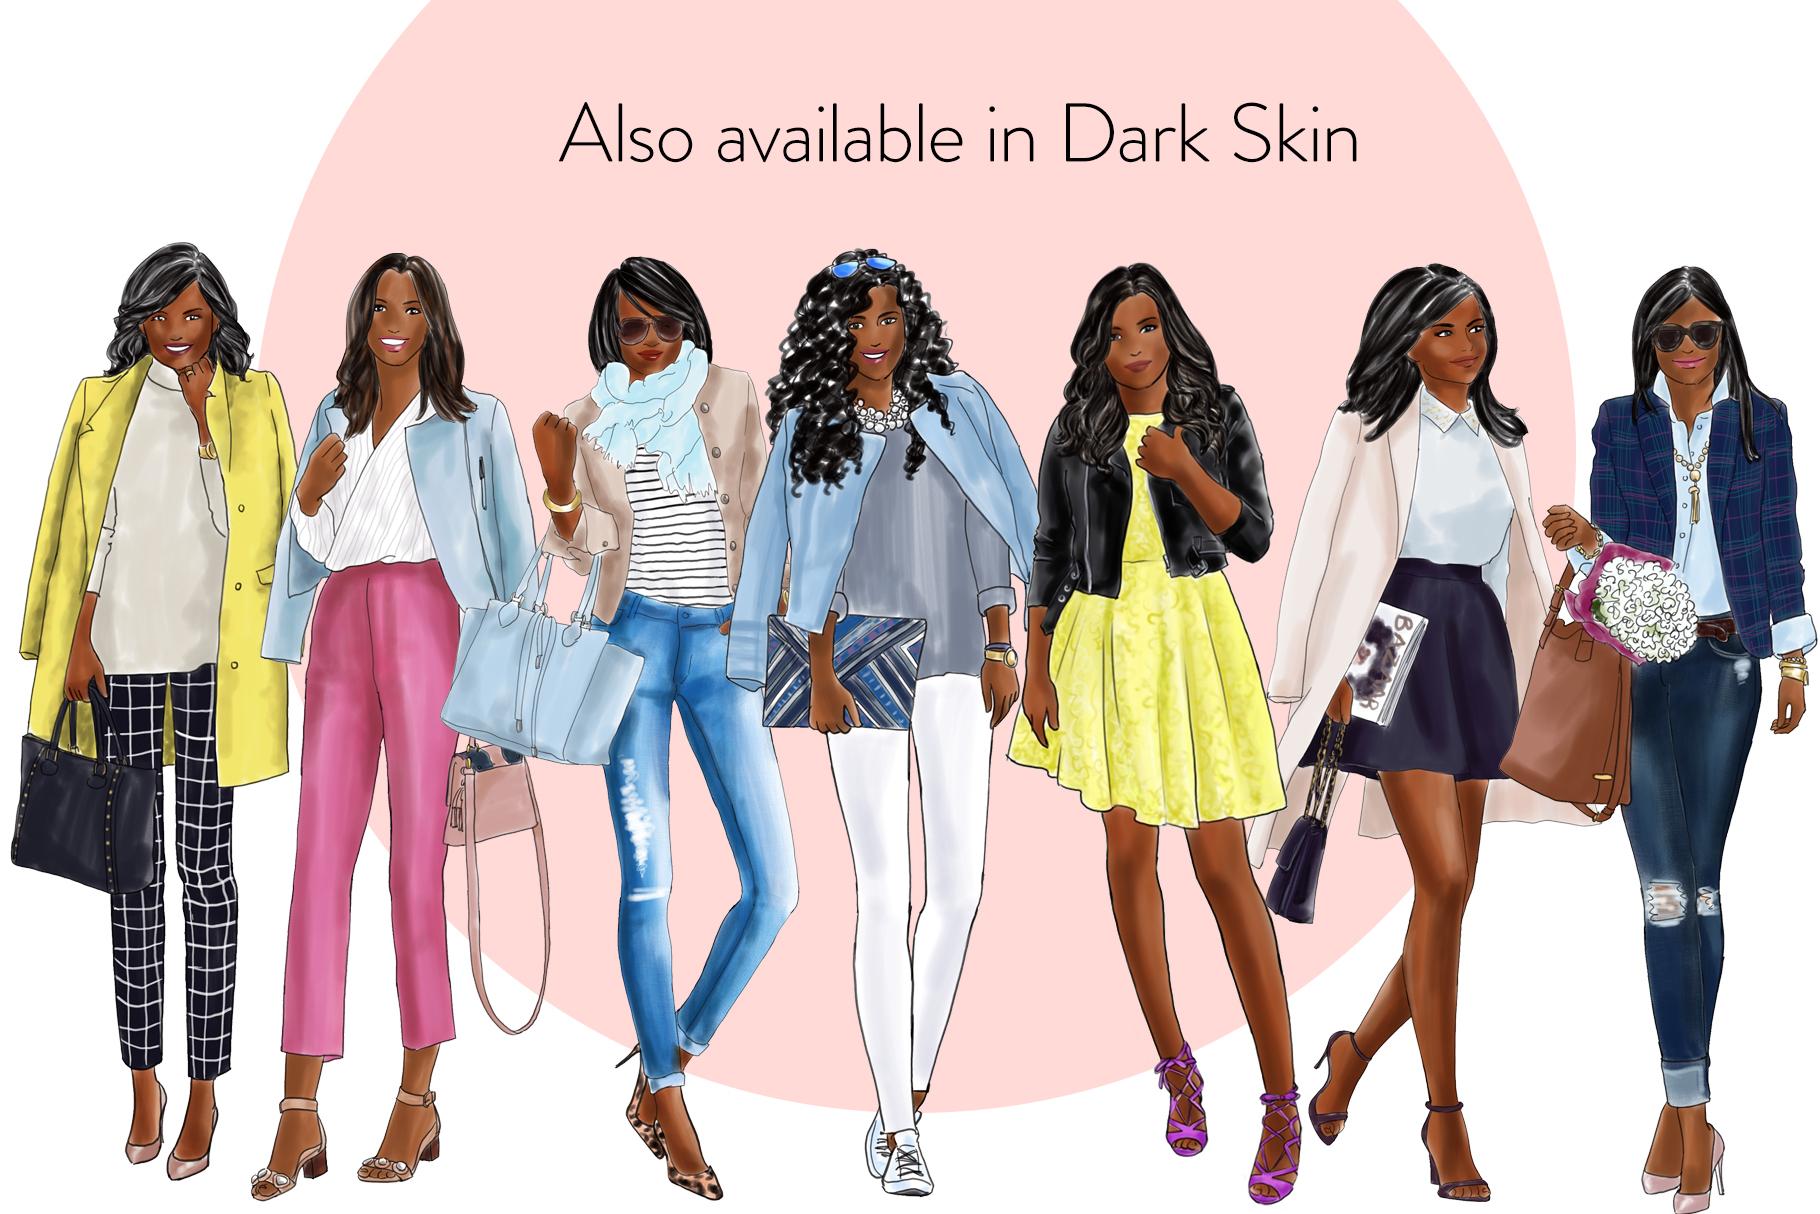 Fashion illustration clipart - Fashion Girls 21 - Light Skin example image 4